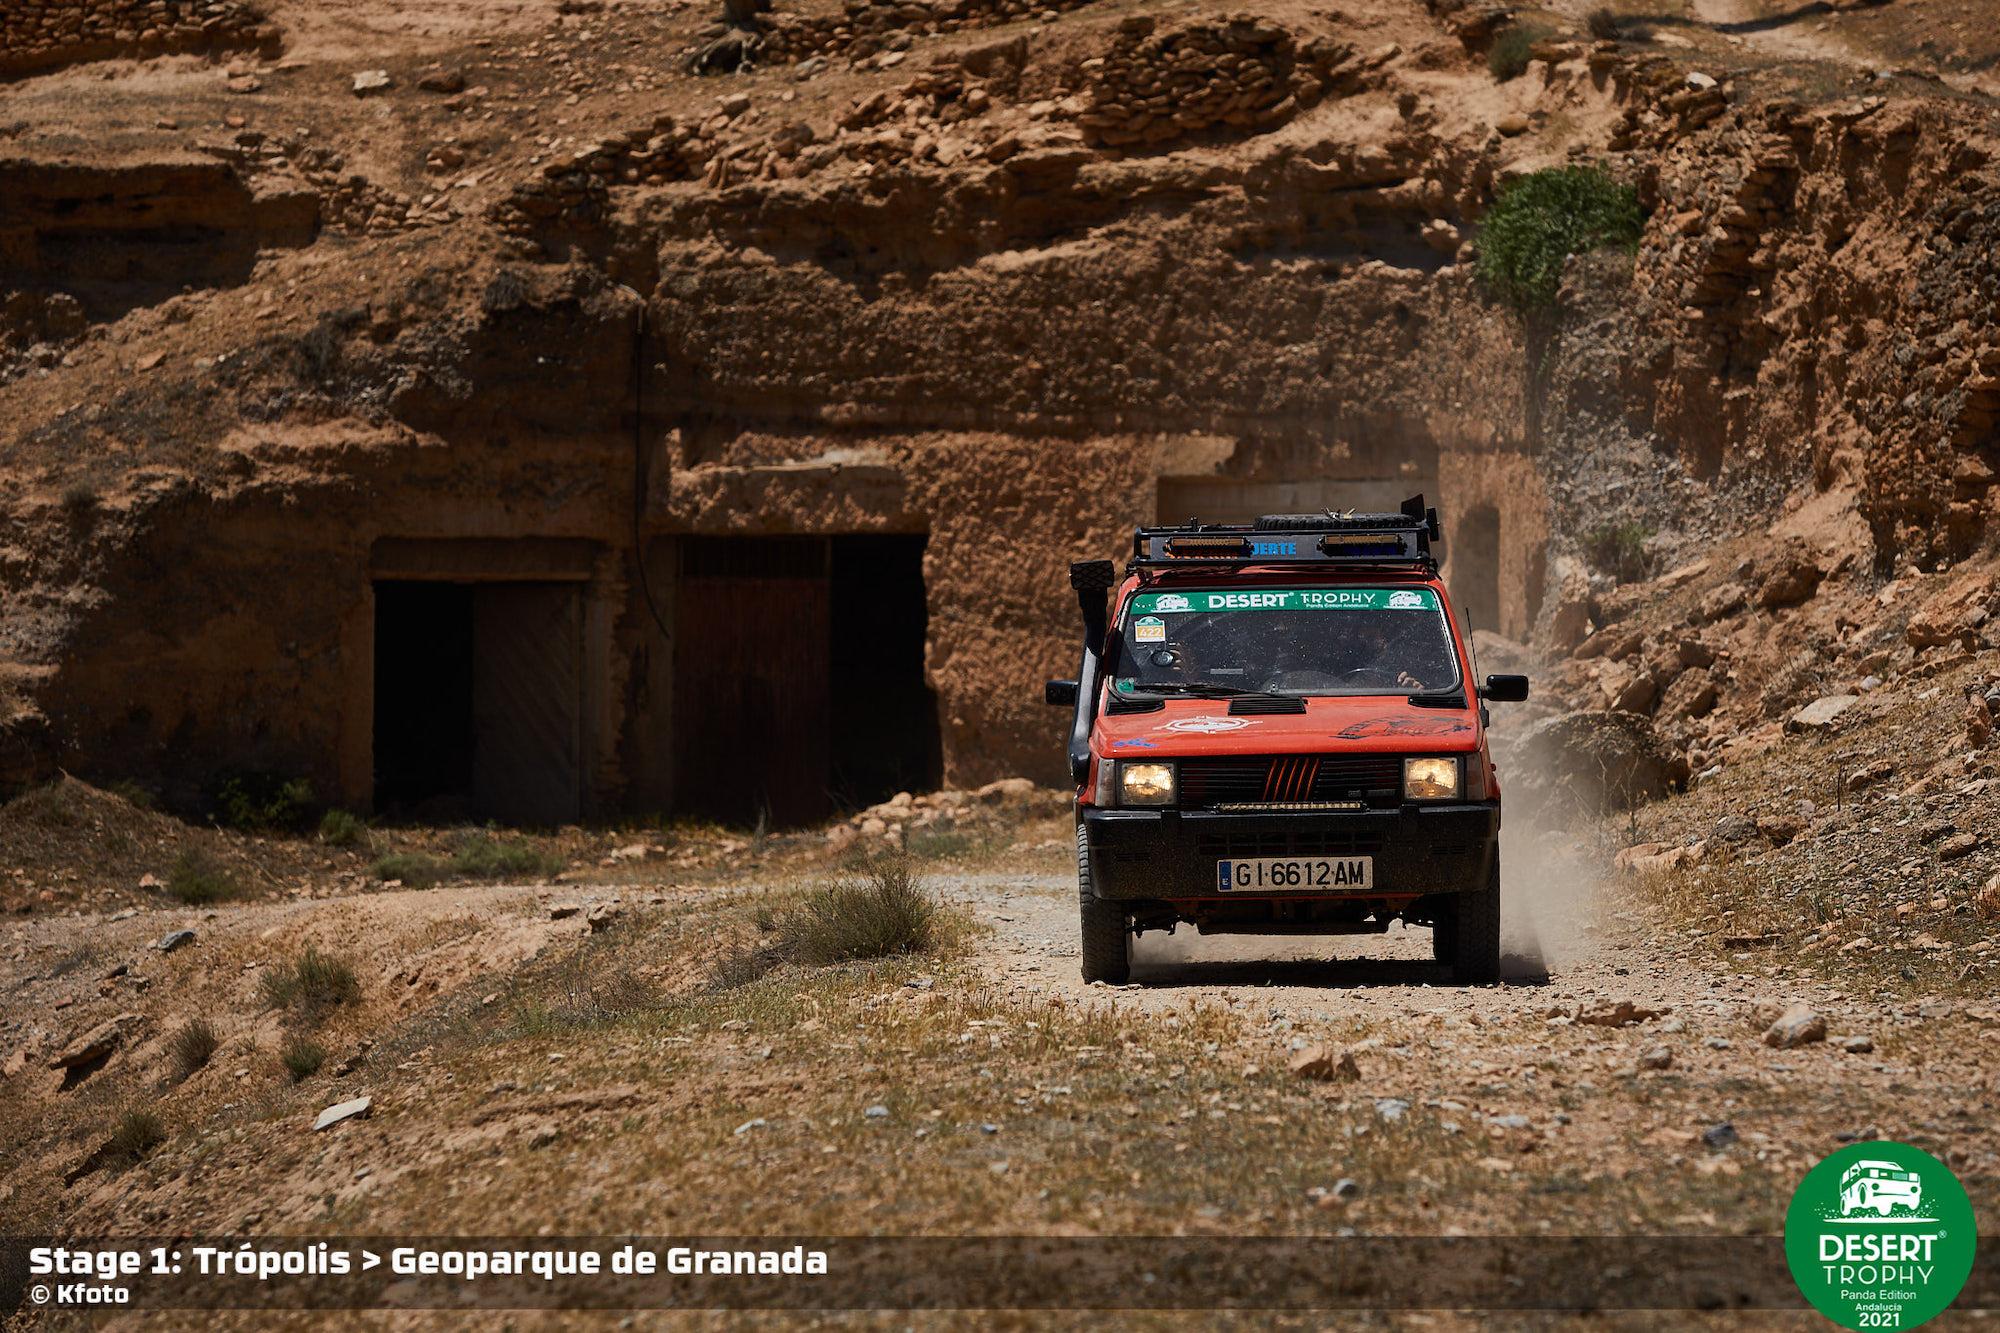 Foto destacada, stage 1 edición andalucia